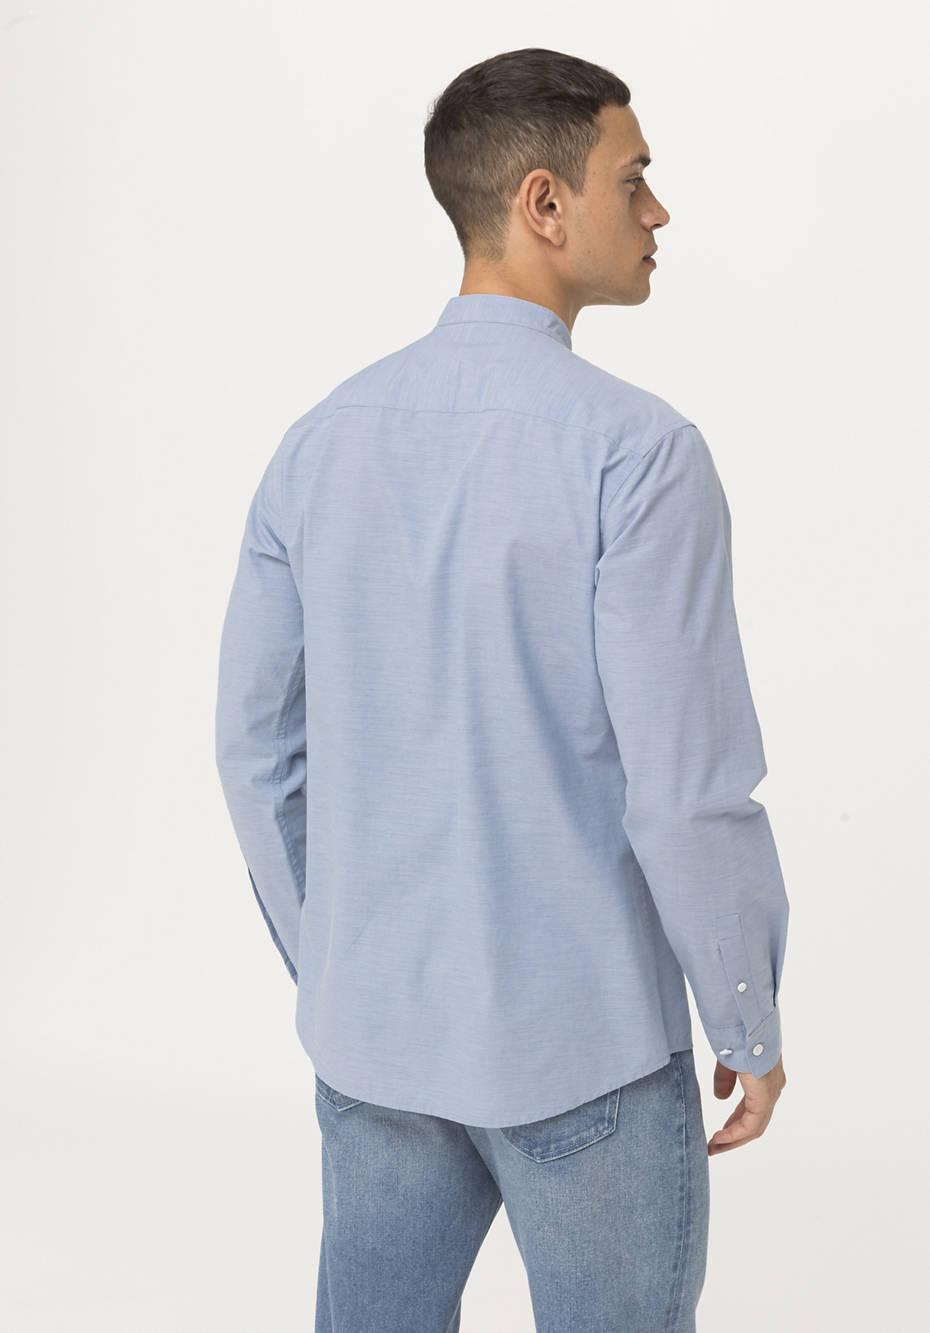 Modern fit shirt made of organic cotton with hemp and yak